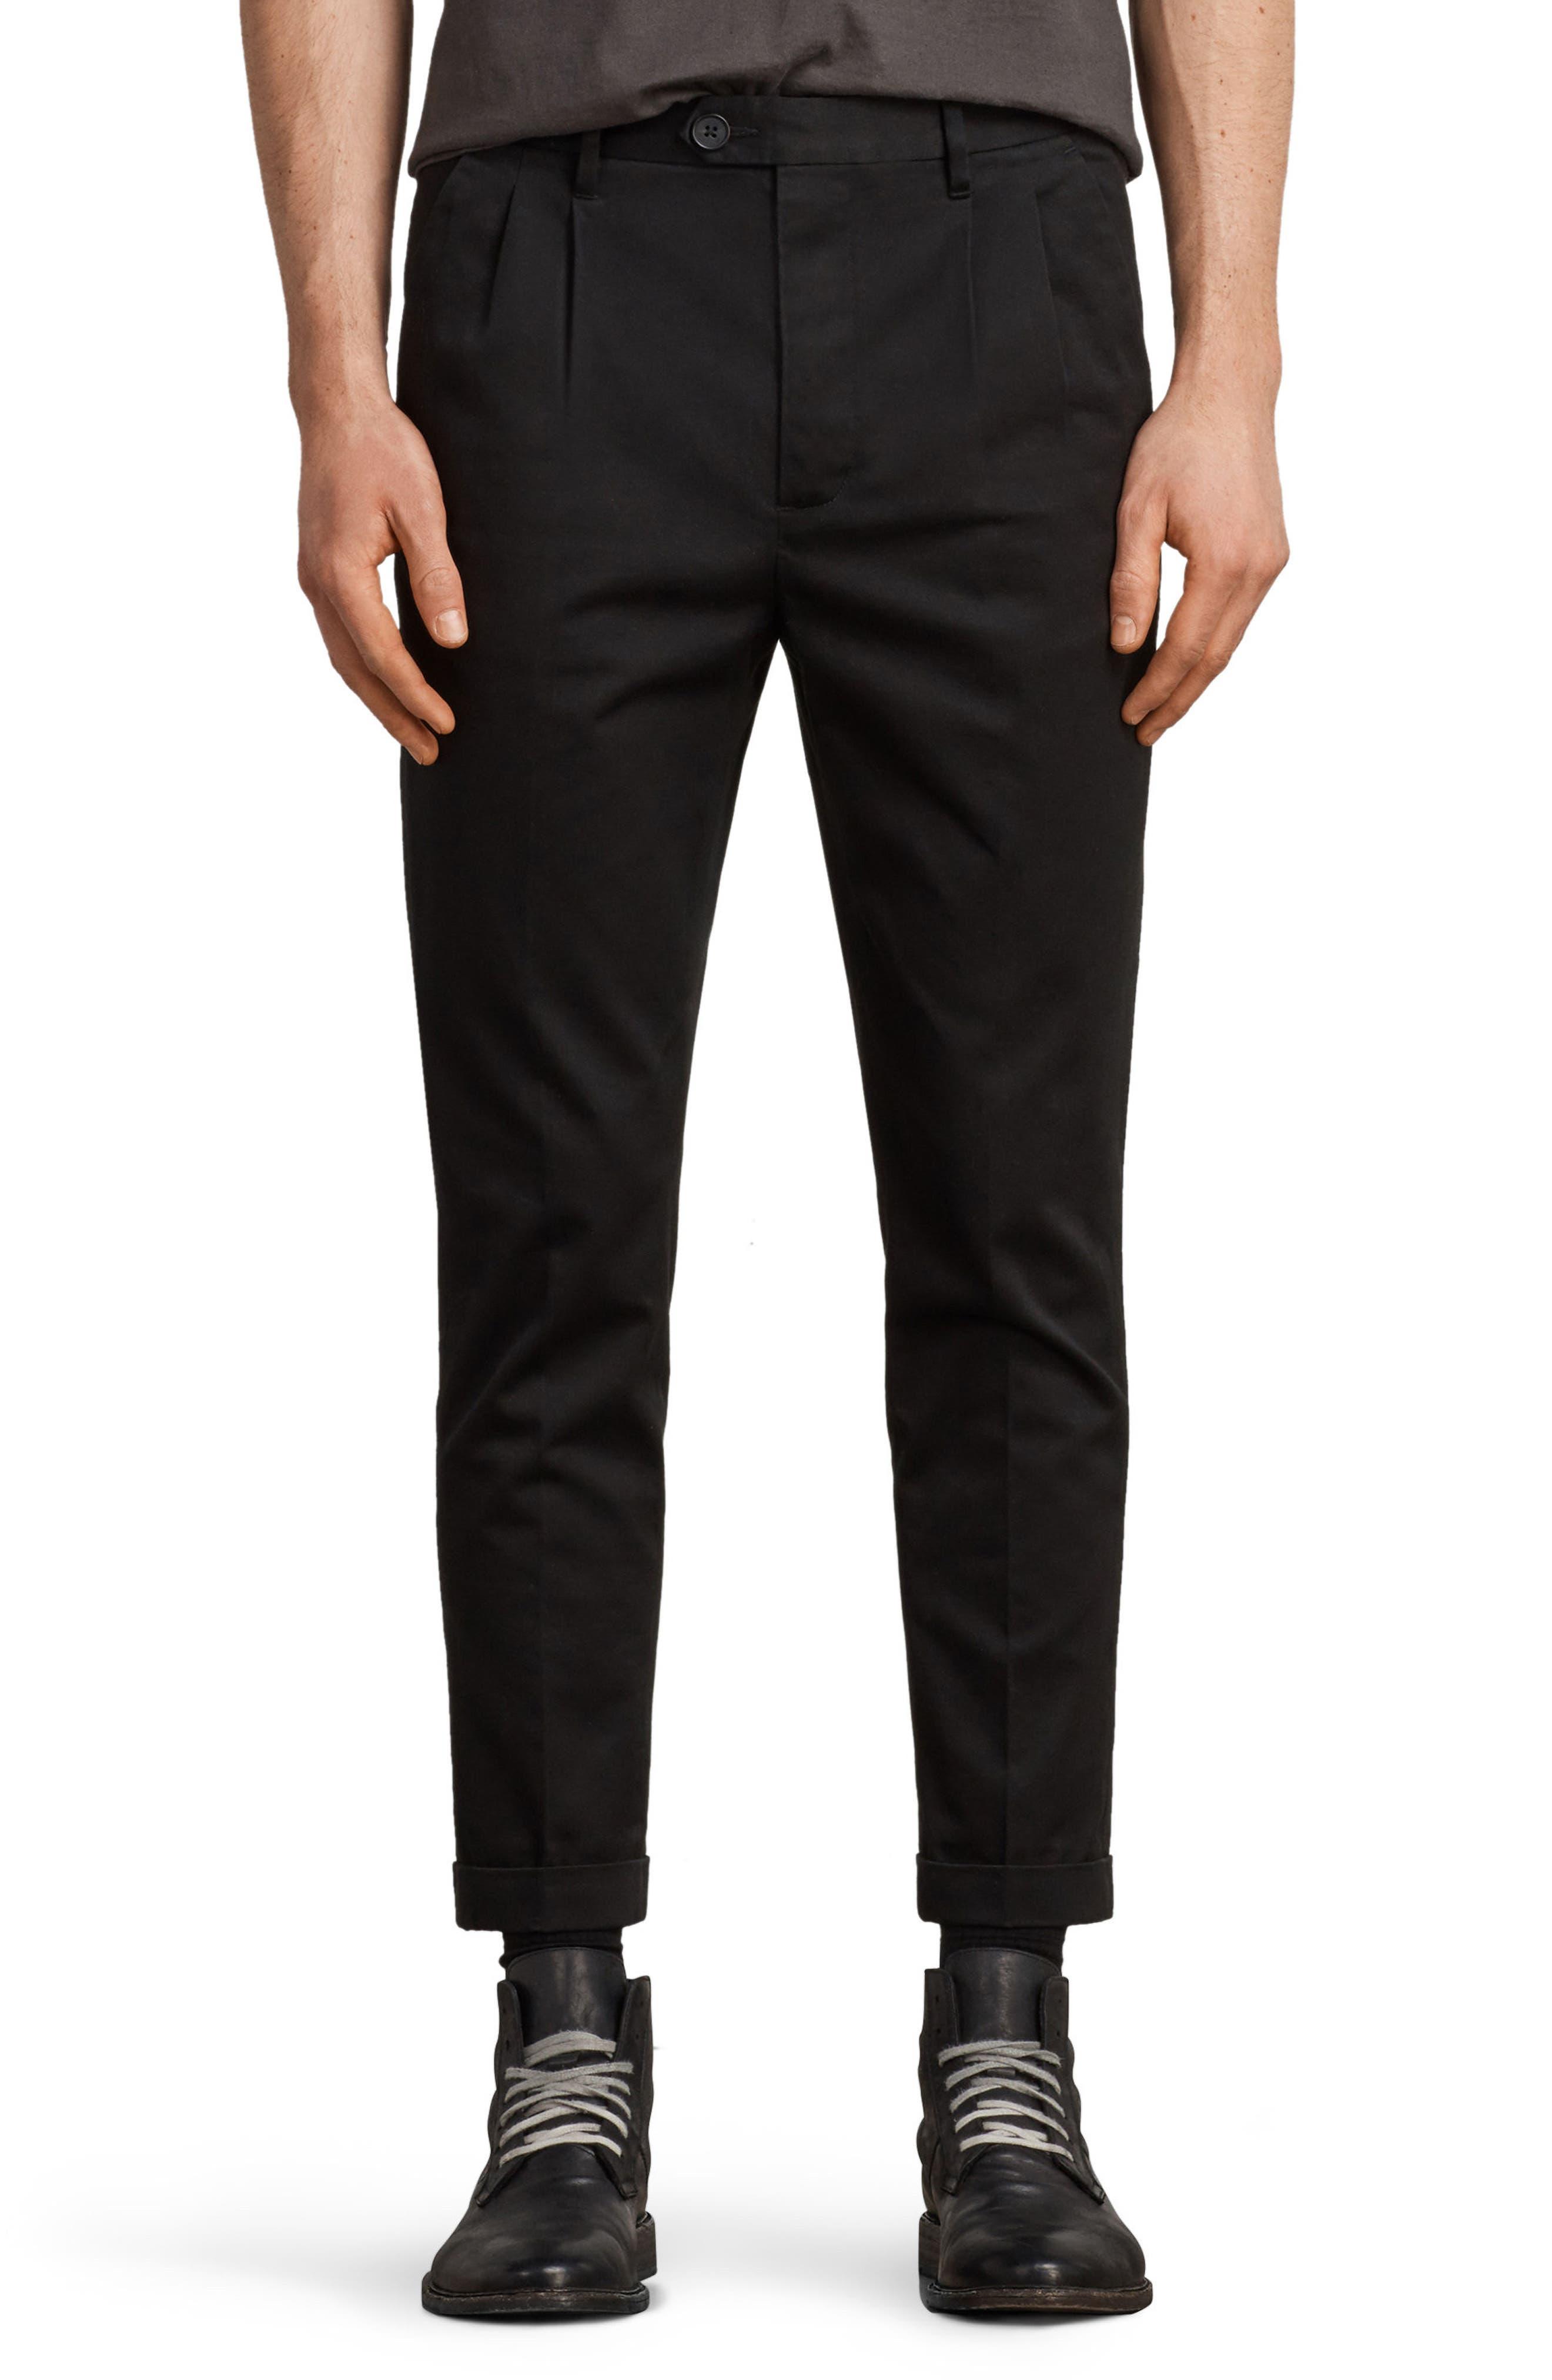 Salco Slim Fit Chino Pants,                         Main,                         color, 001